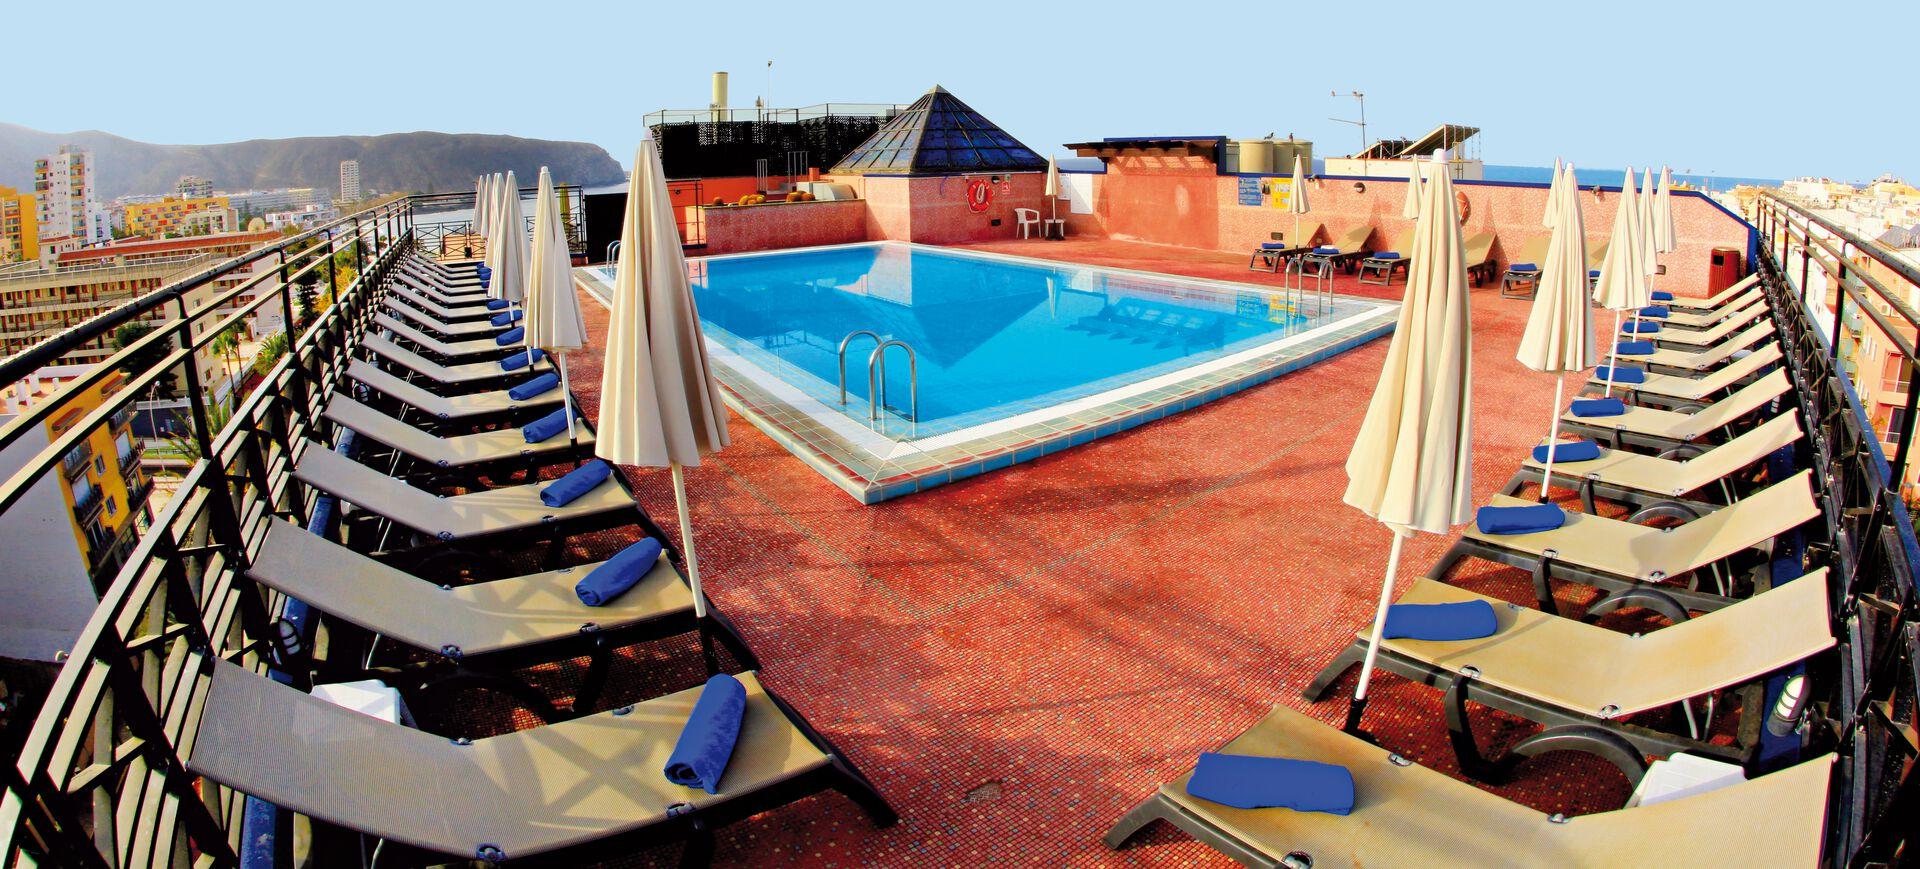 Séjour Tenerife - Hotel LABRANDA Reveron Plaza - 4*